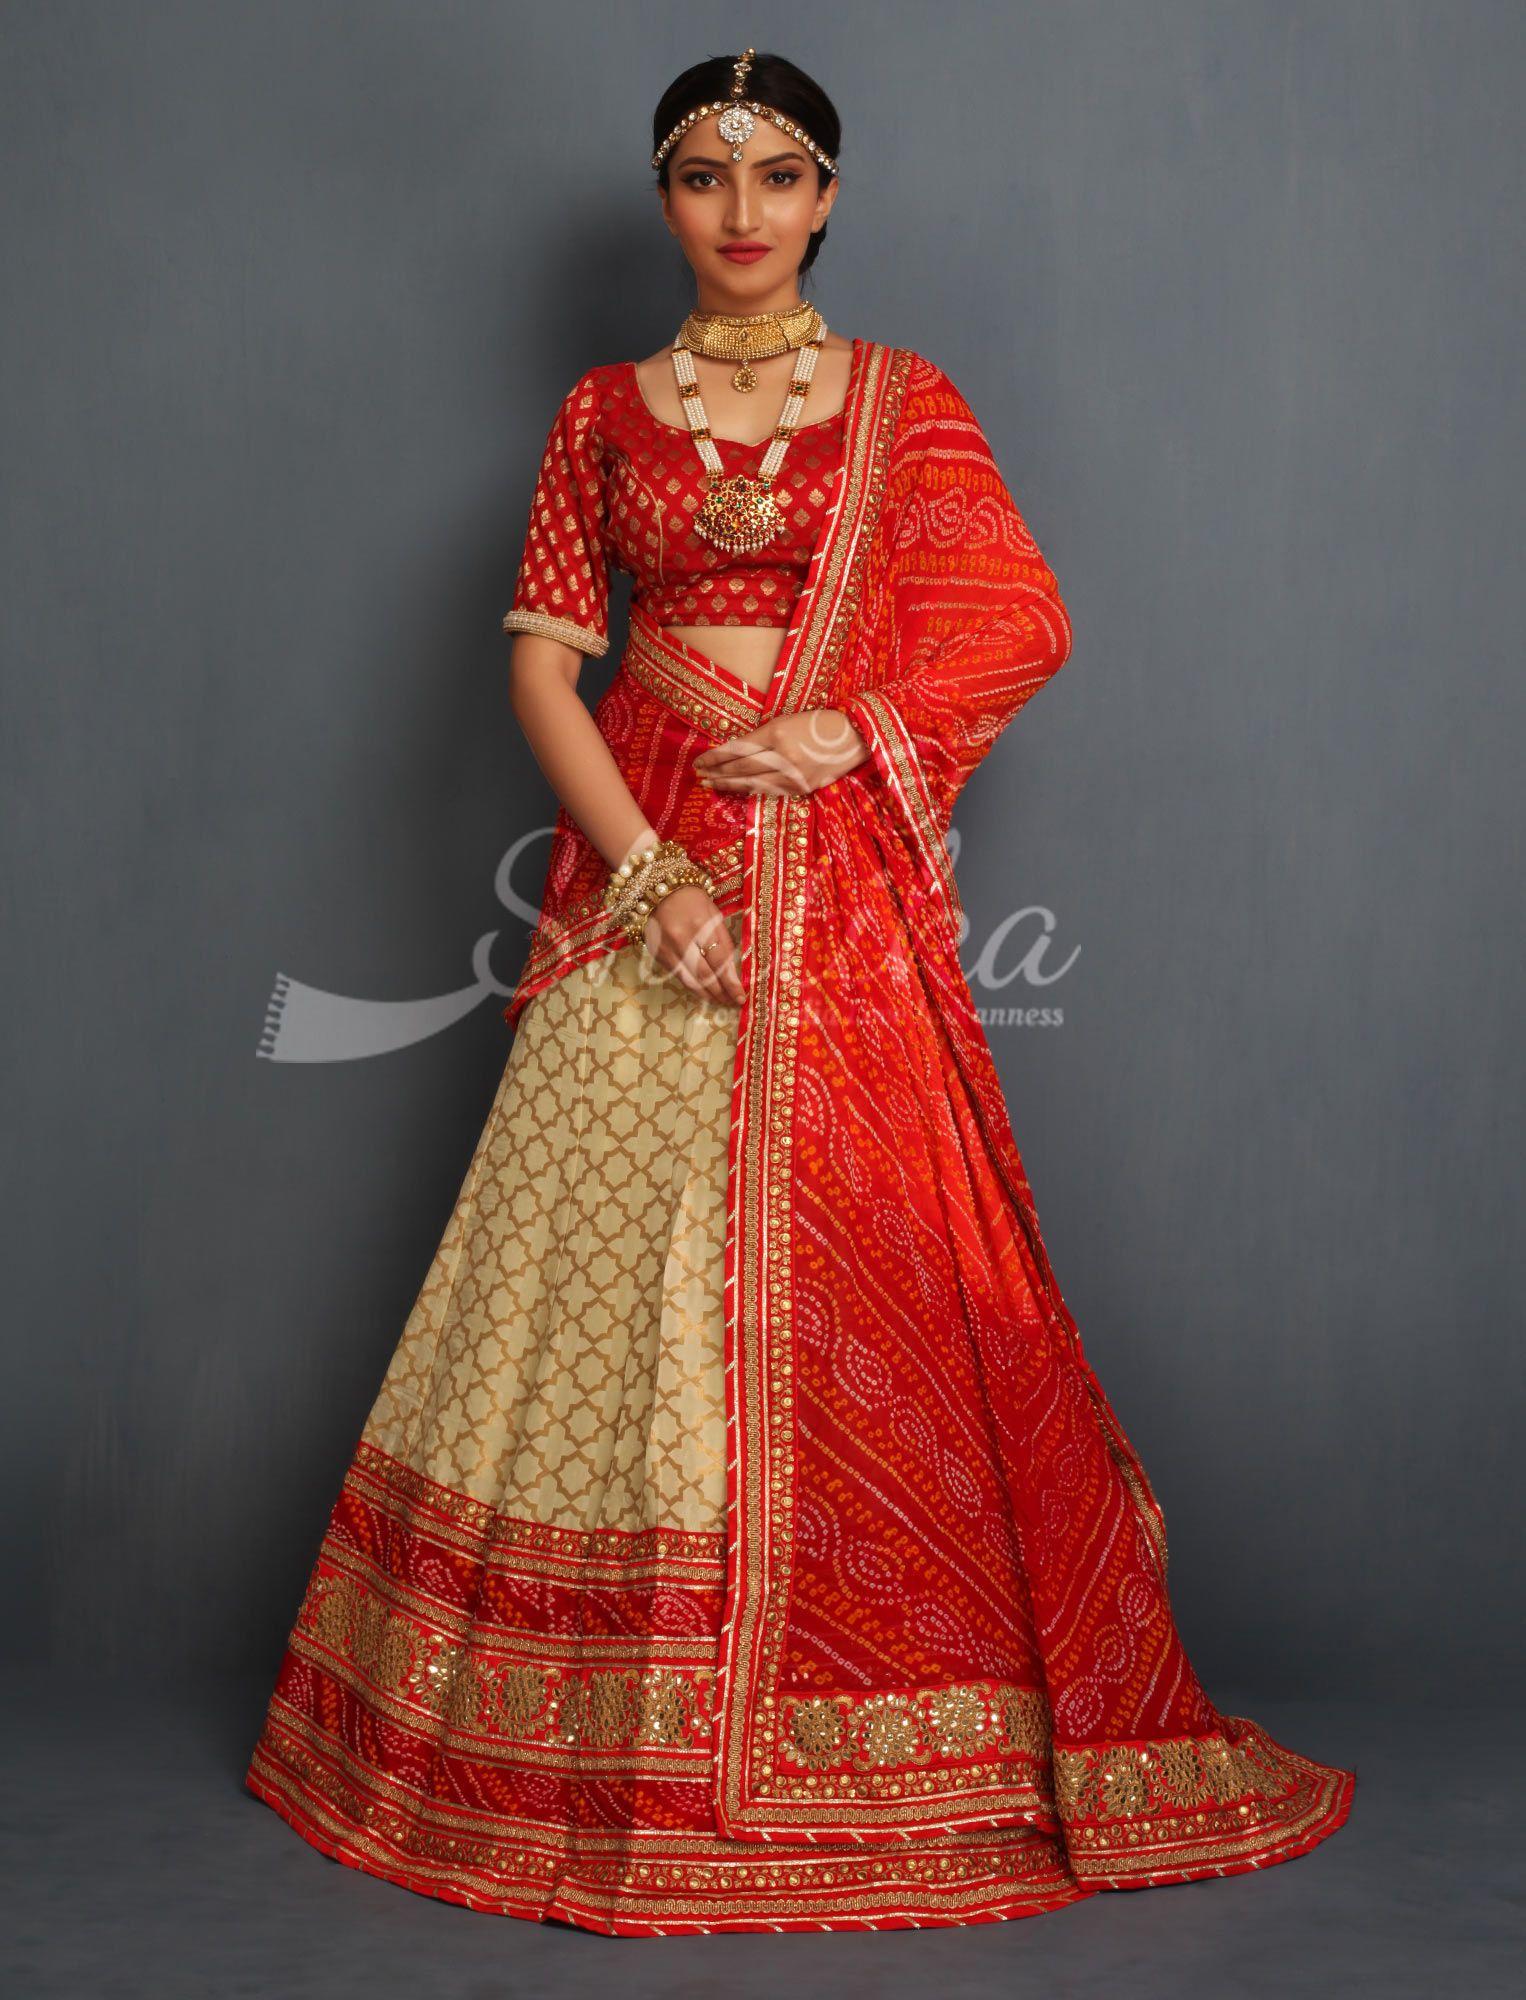 7d4151f36a Poornima Cream And Gold Heavy Contrast Border Bandhej Odhni Designer  Rajasthani Lehenga